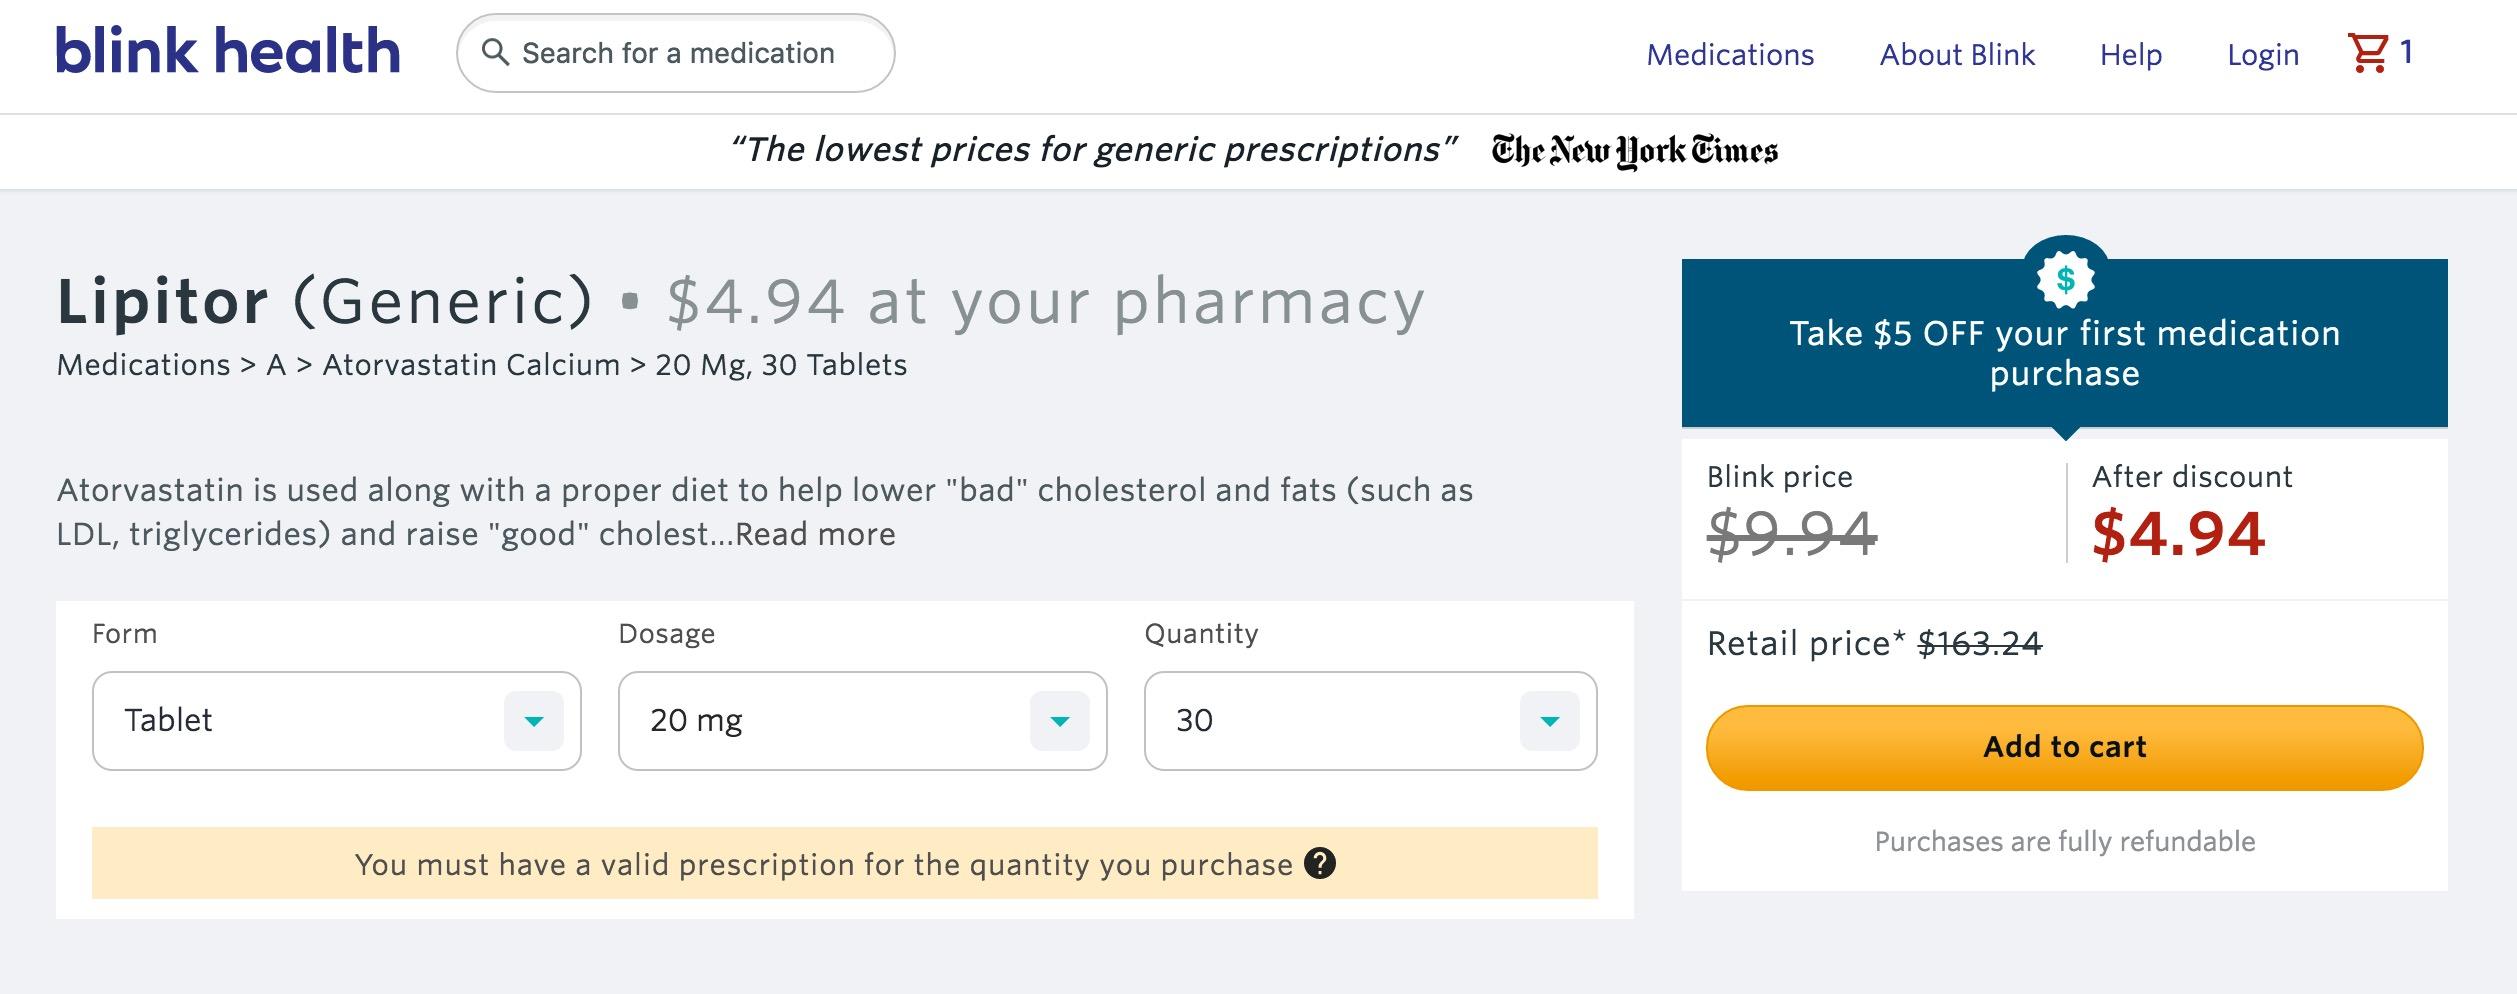 blink health save prescriptions